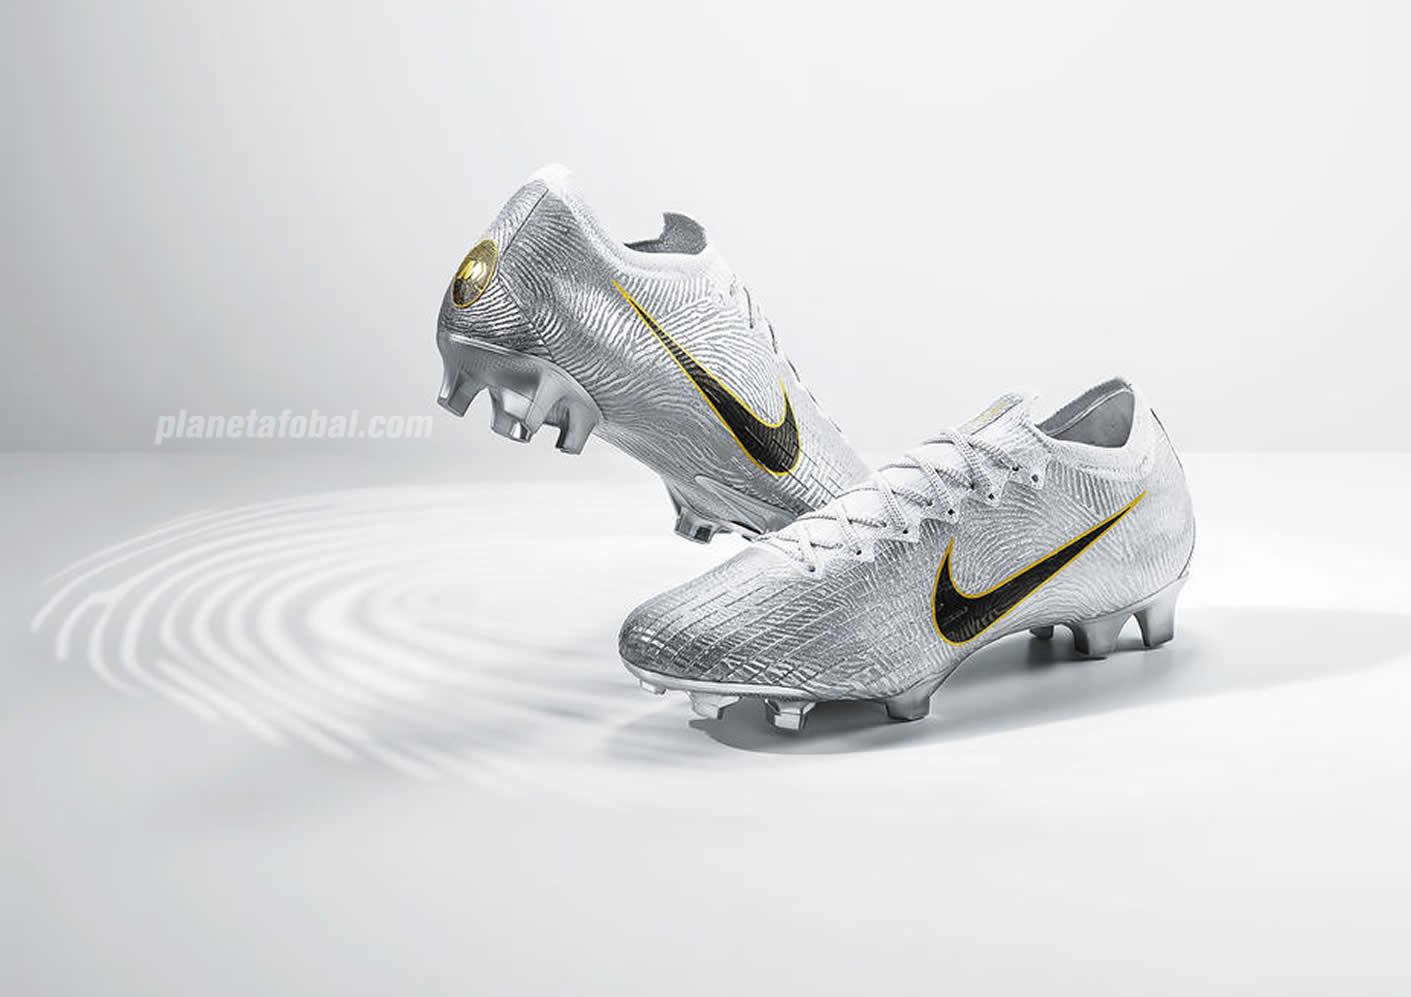 Botines Golden Touch Vapor 360 de Luka Modric | Imagen Nike